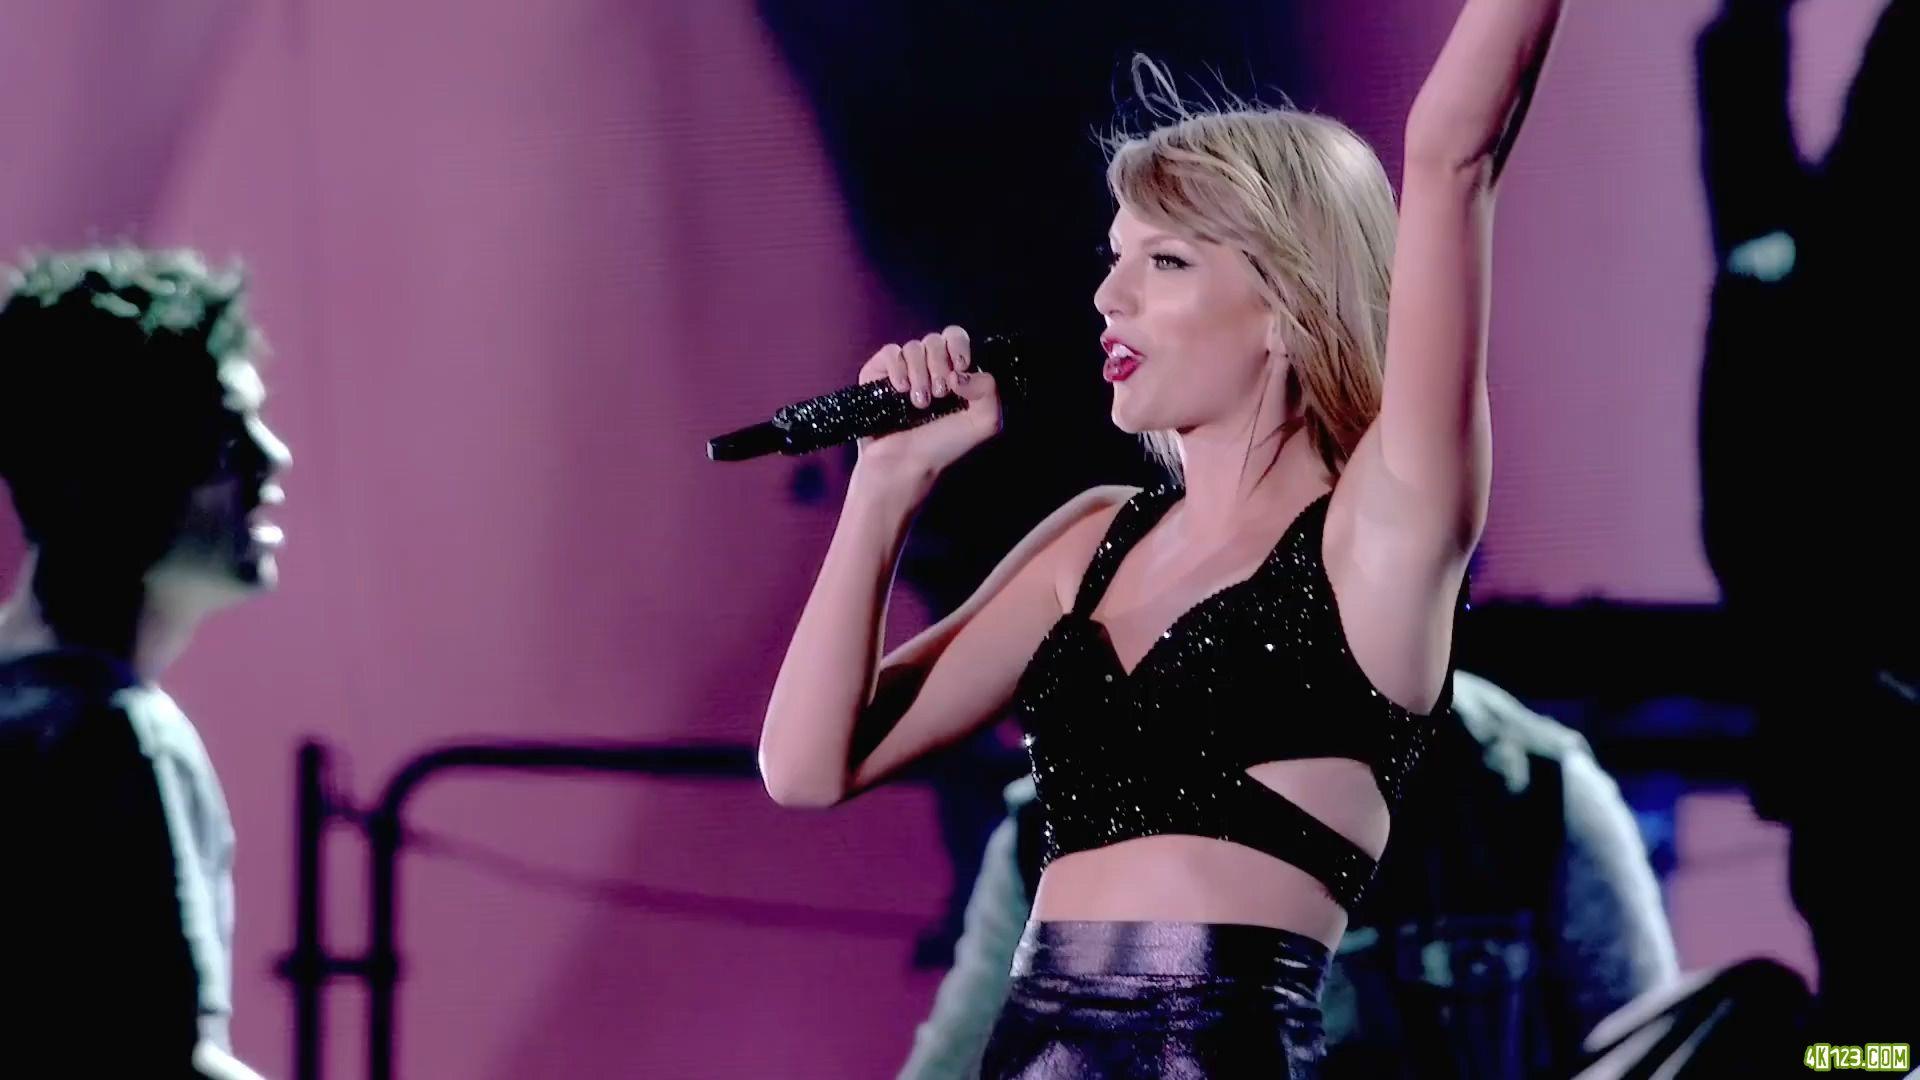 Taylor Swift - New Romantics.BluRayMasterRip.1080p.60fps.x264.DualAudio.AC3.DTS..jpg